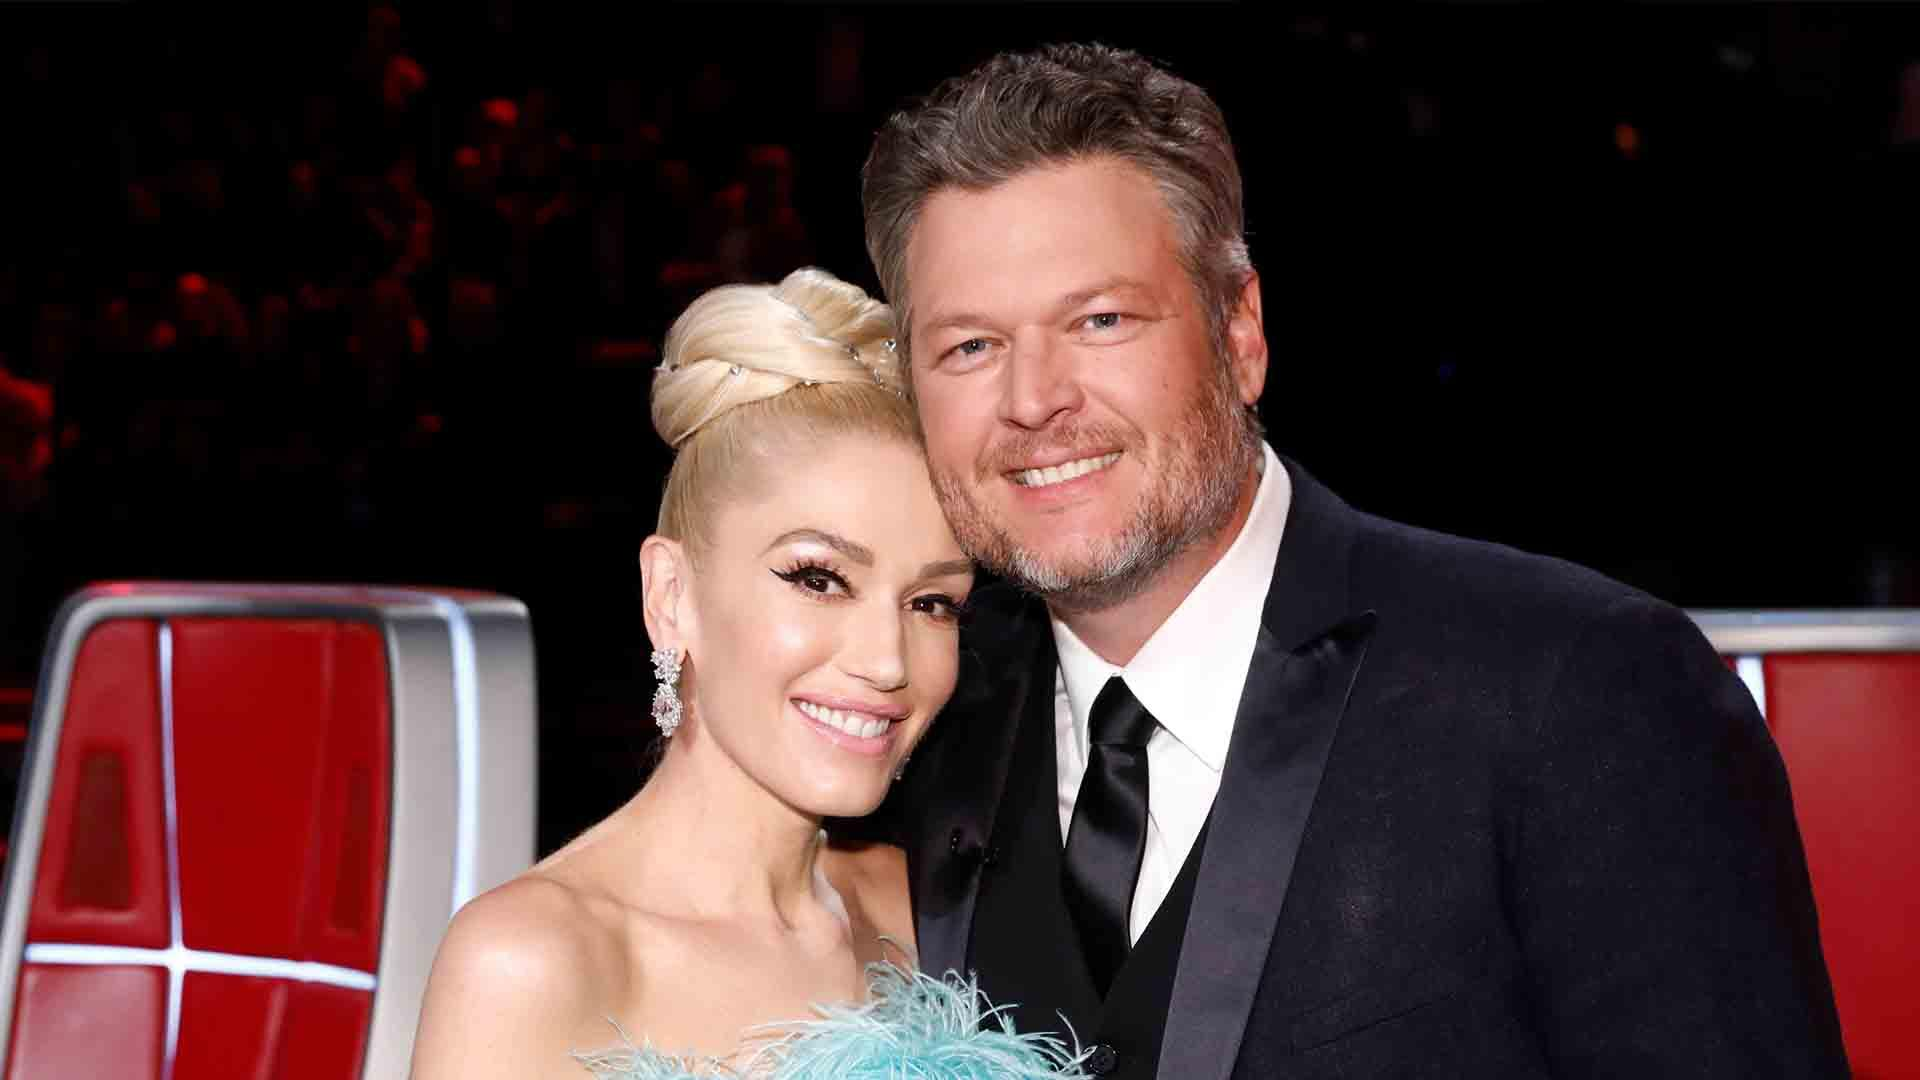 Blake Shelton, Gwen Stefani Wedding Tentatively Set For Summer